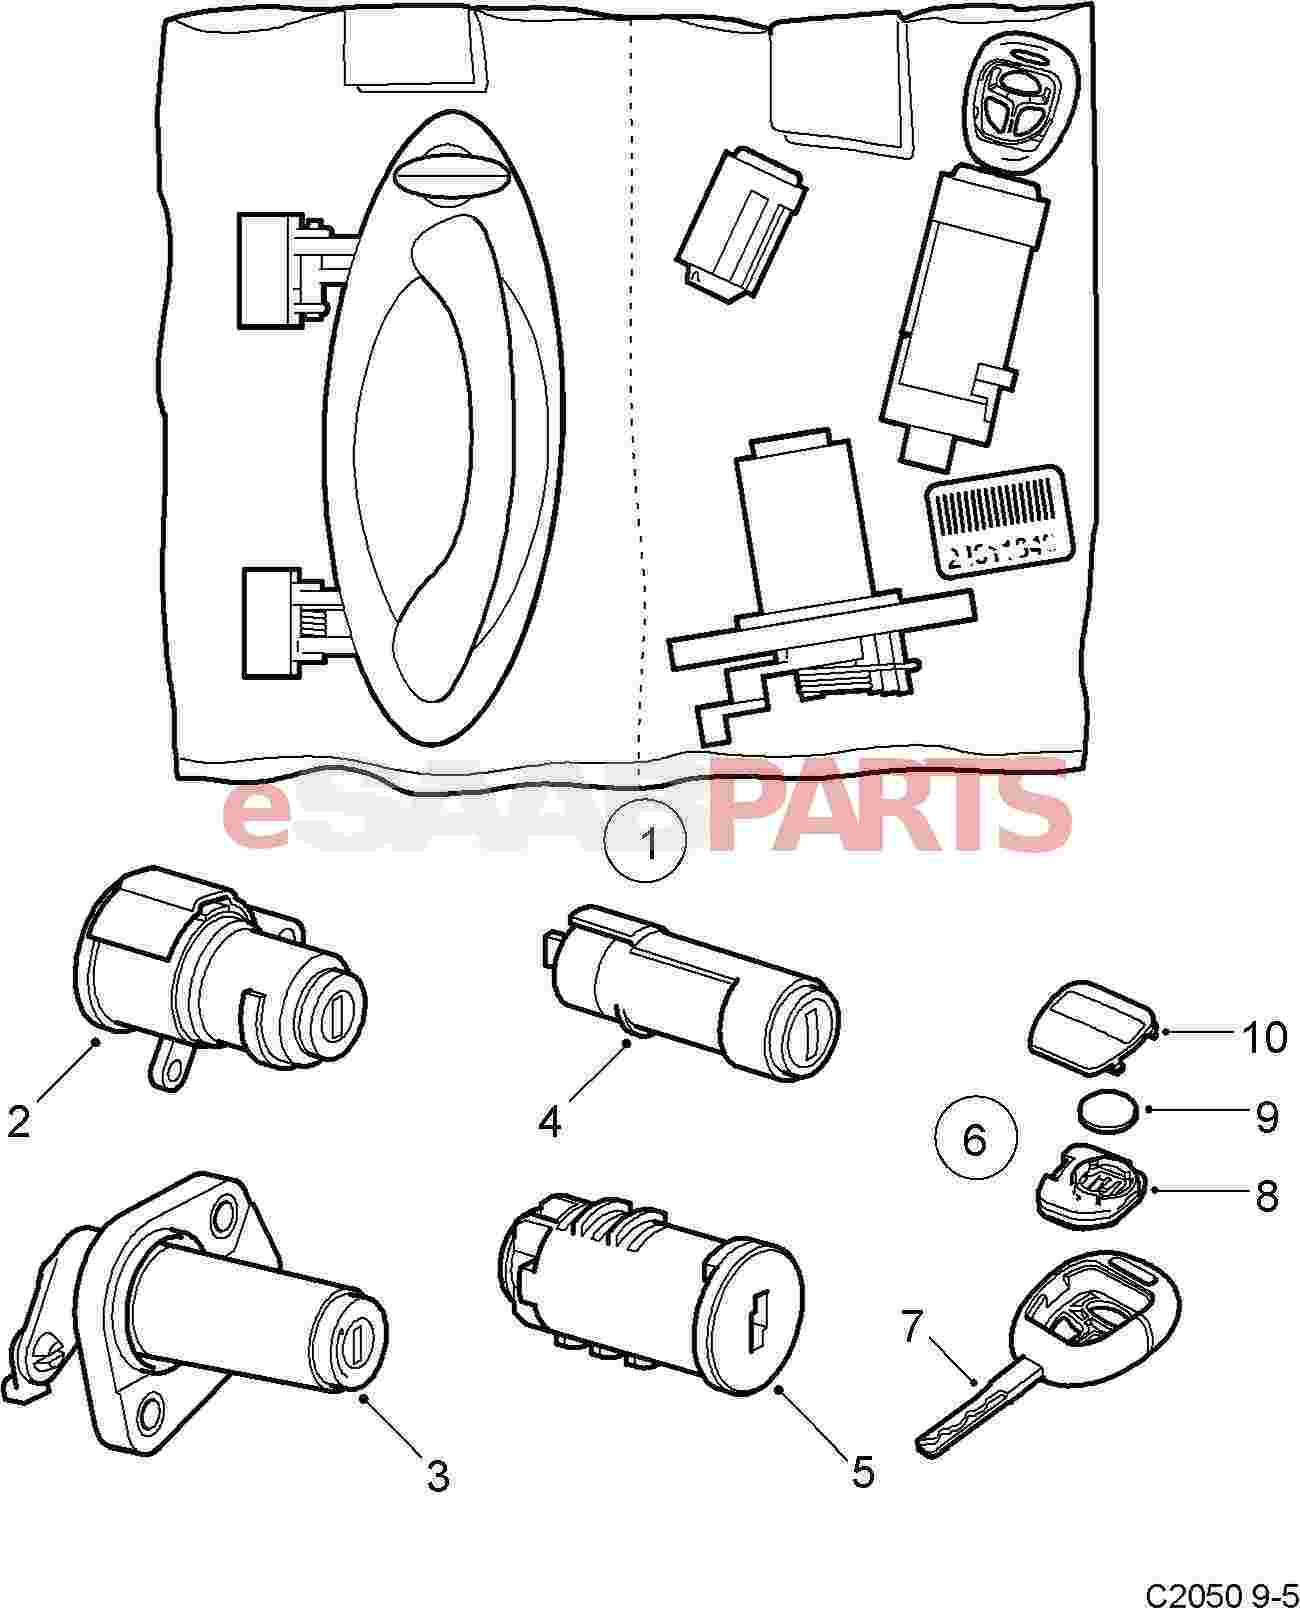 32018043 saab key blade cut 9 5 2003 2009 genuine saab parts rh esaabparts com Saab Parts Diagram 2003 Saab 9-3 Fuse Box Diagram